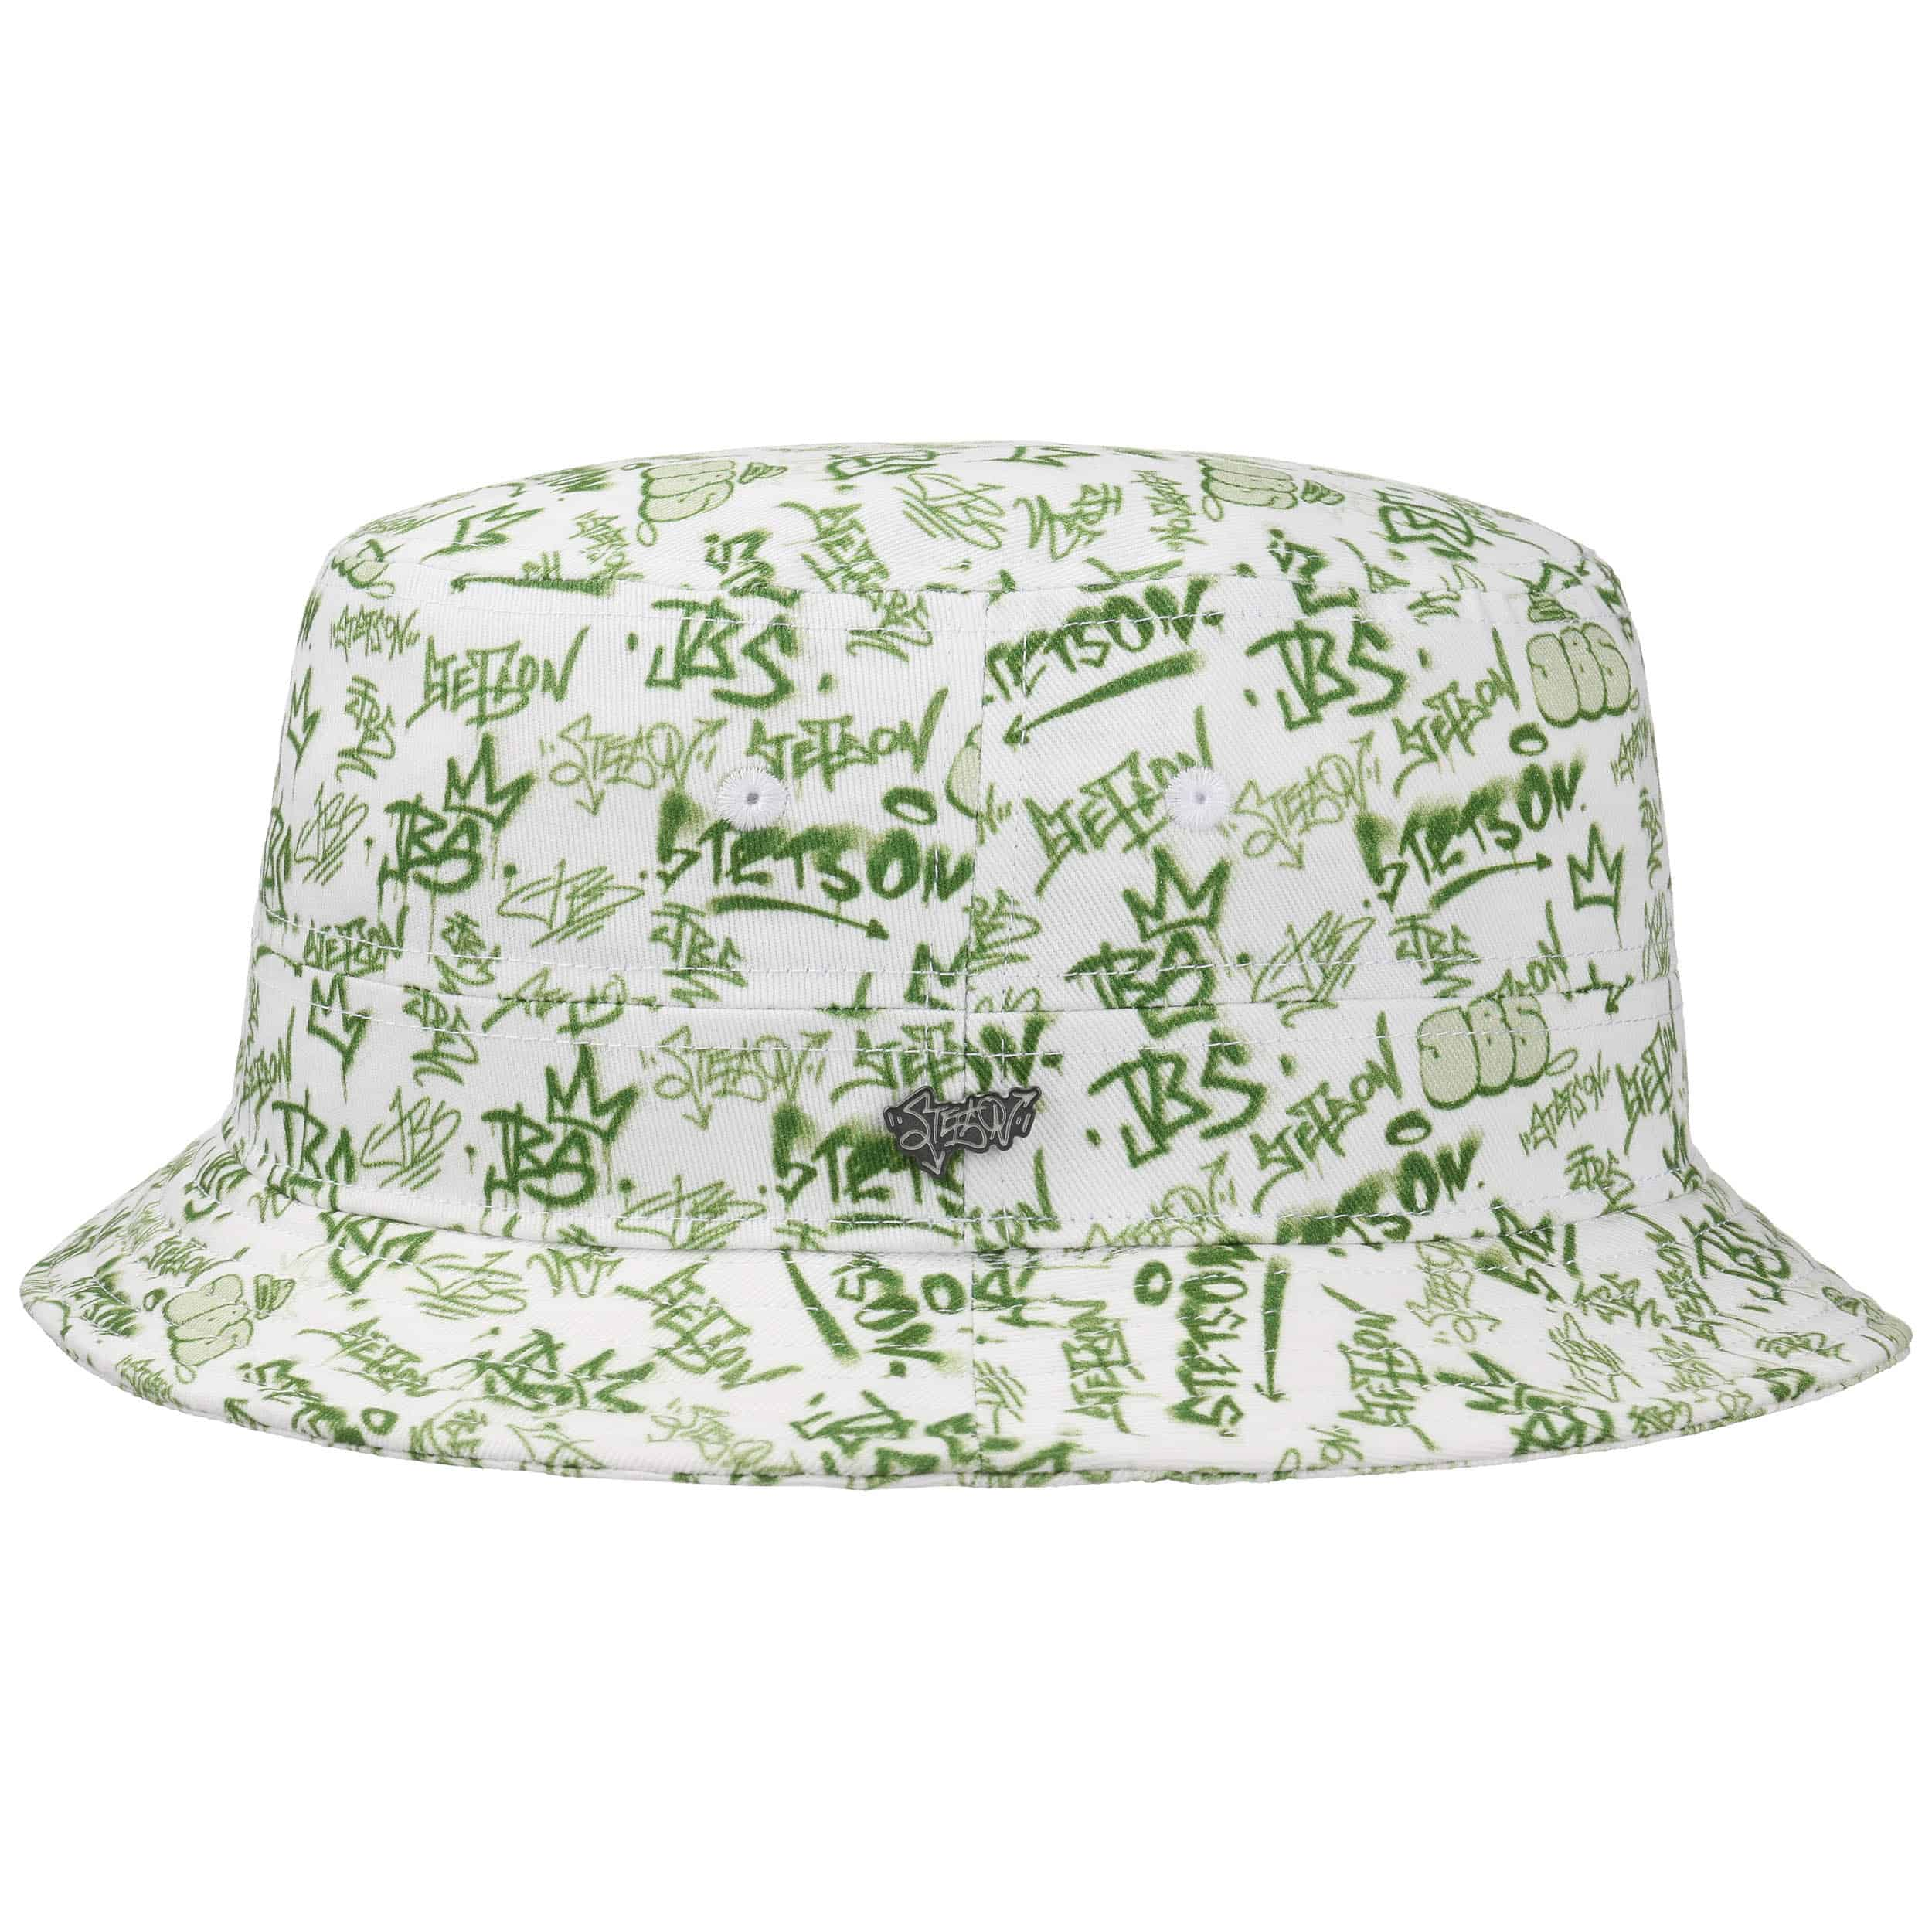 ... JBS-Graffiti Bucket Hat by Stetson - green 4 671506905e6